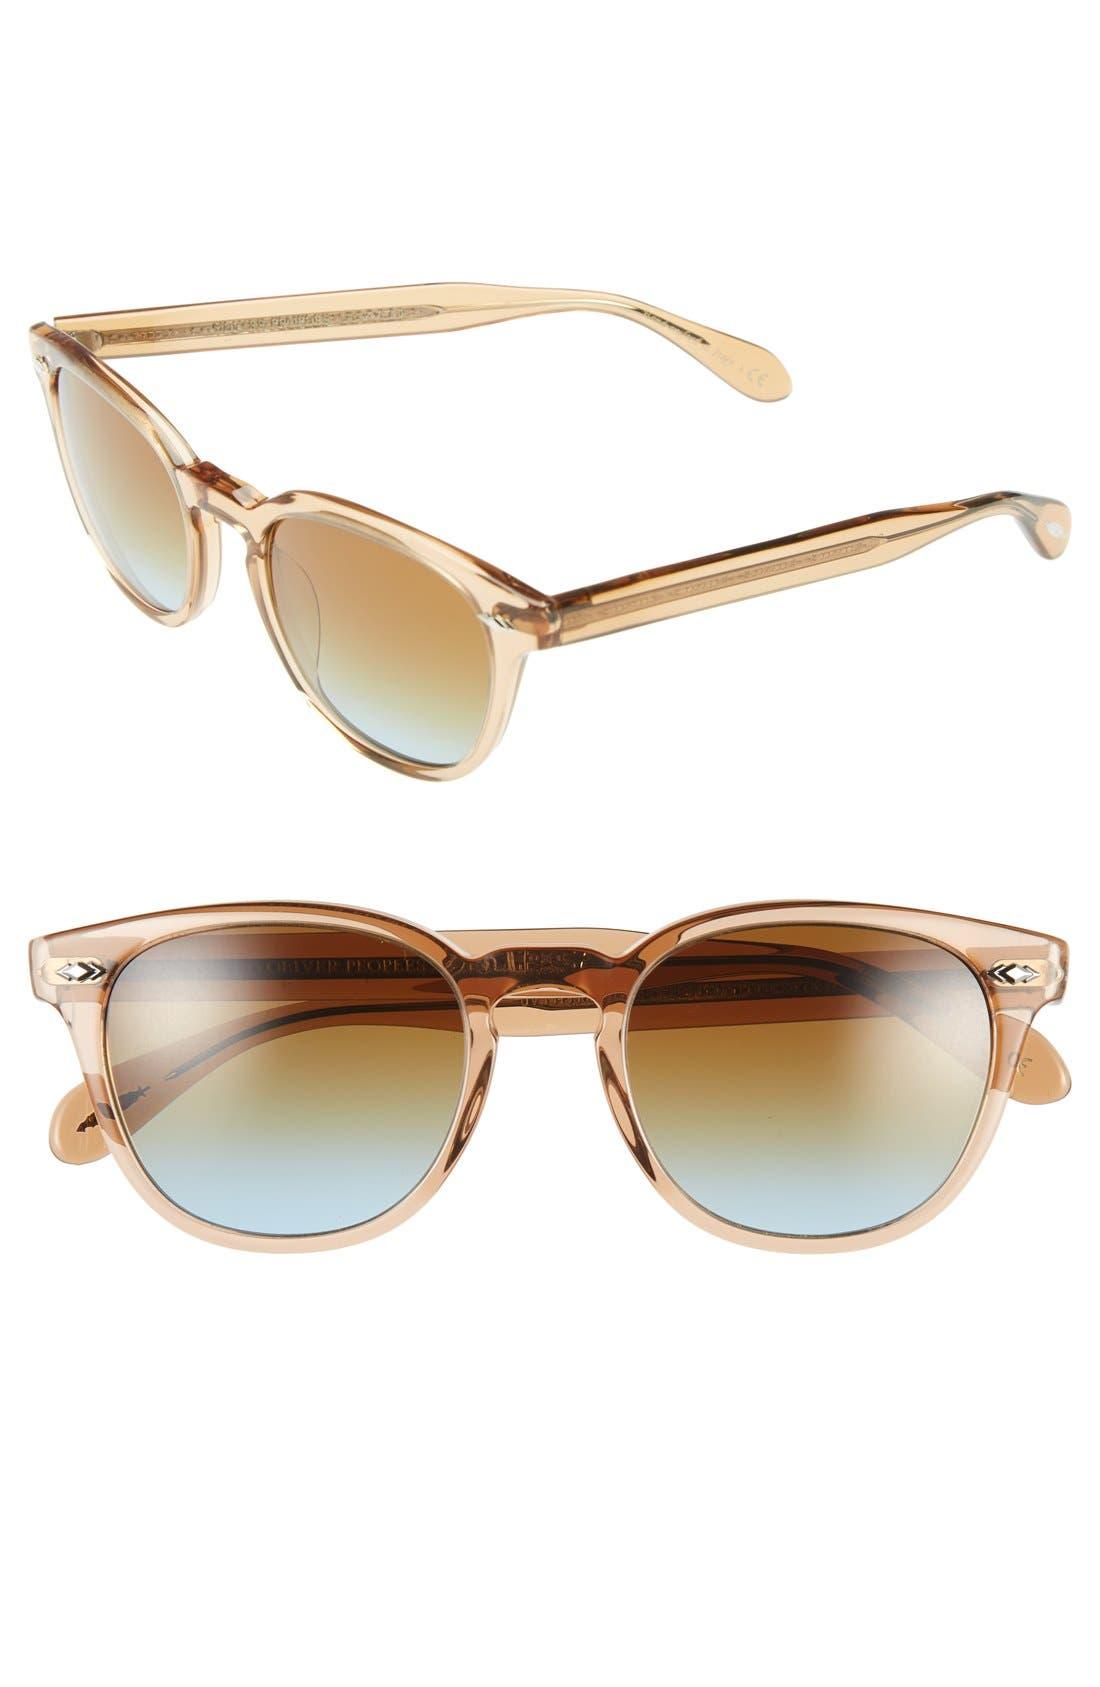 Alternate Image 1 Selected - Oliver Peoples 'Sheldrake Plus' 52mm Retro Sunglasses